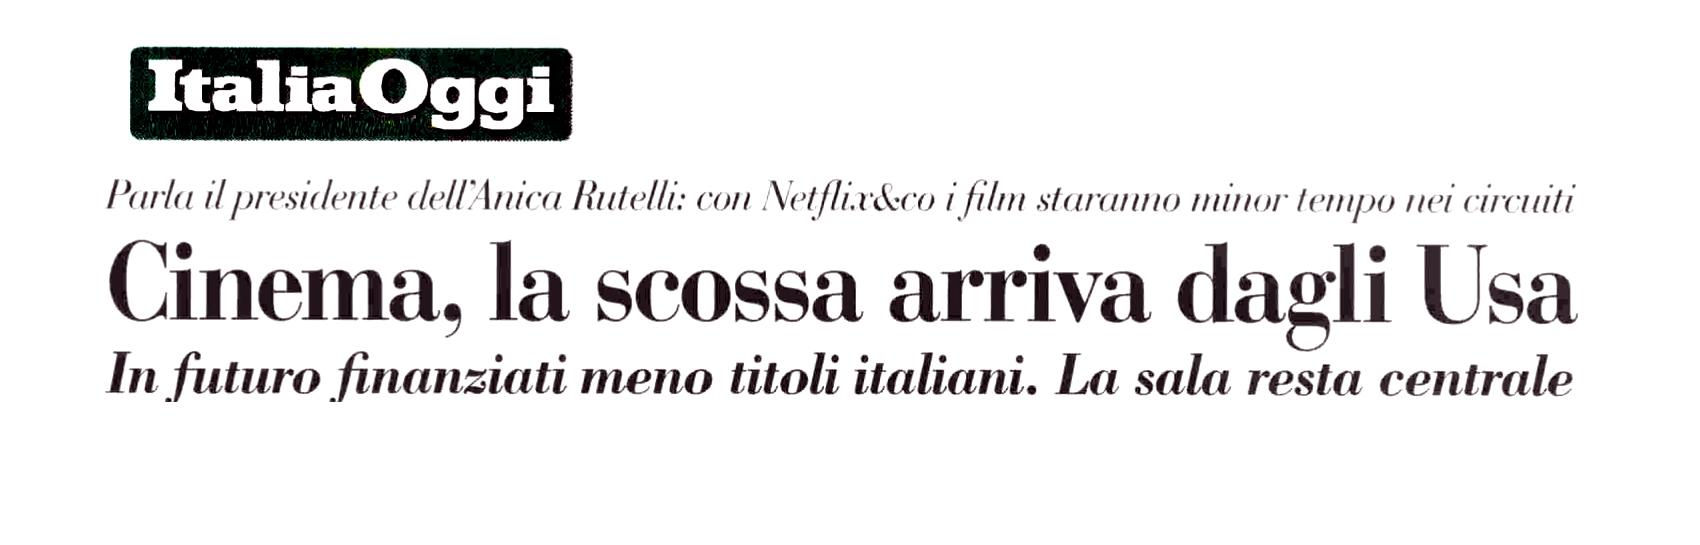 banner_highlights_ItaliaOggi_Int.Rutelli_20180118